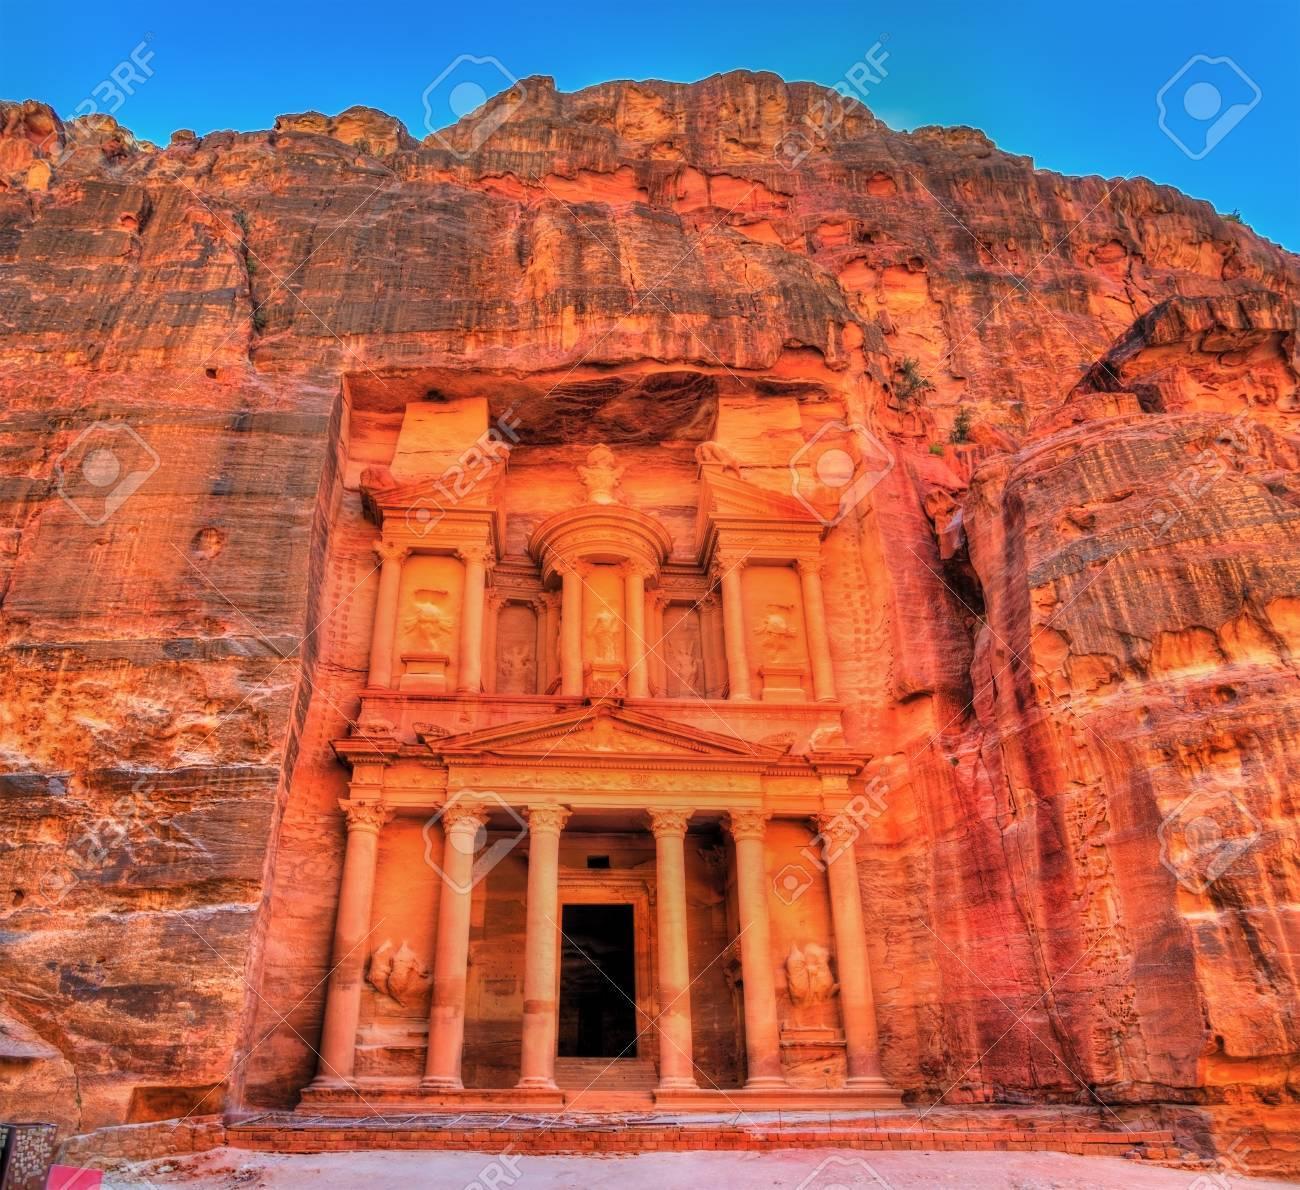 Al Khazneh temple in Petra. UNESCO world heritage site - 75611105